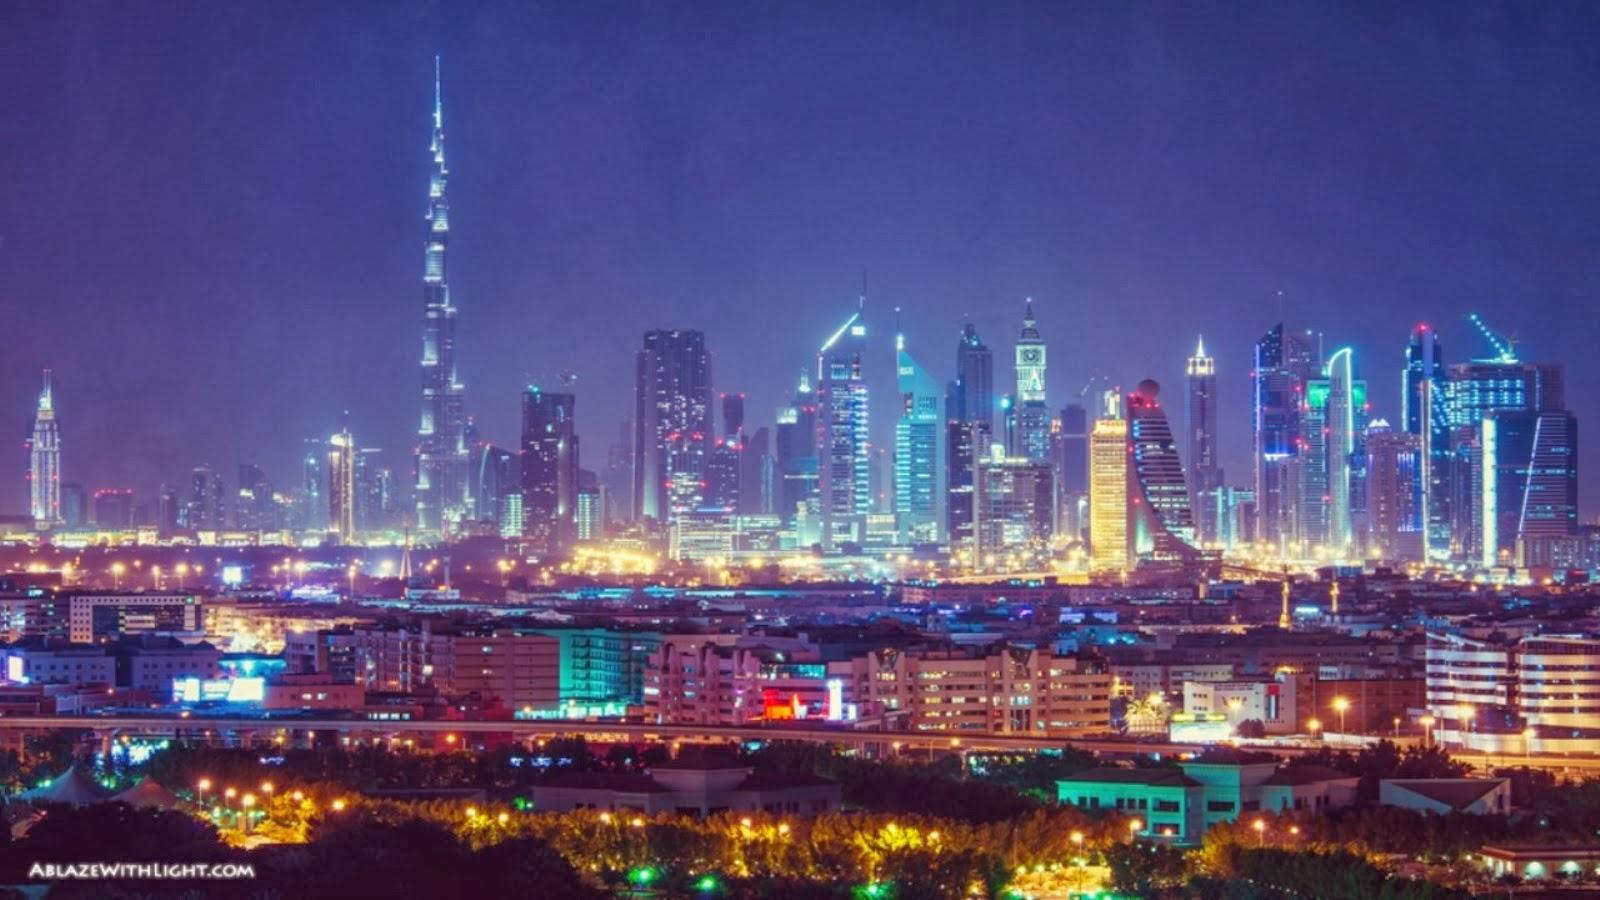 Hd wallpaper zip - Hd Wallpapers Download Dubai City Hd Wallpapers 1080p